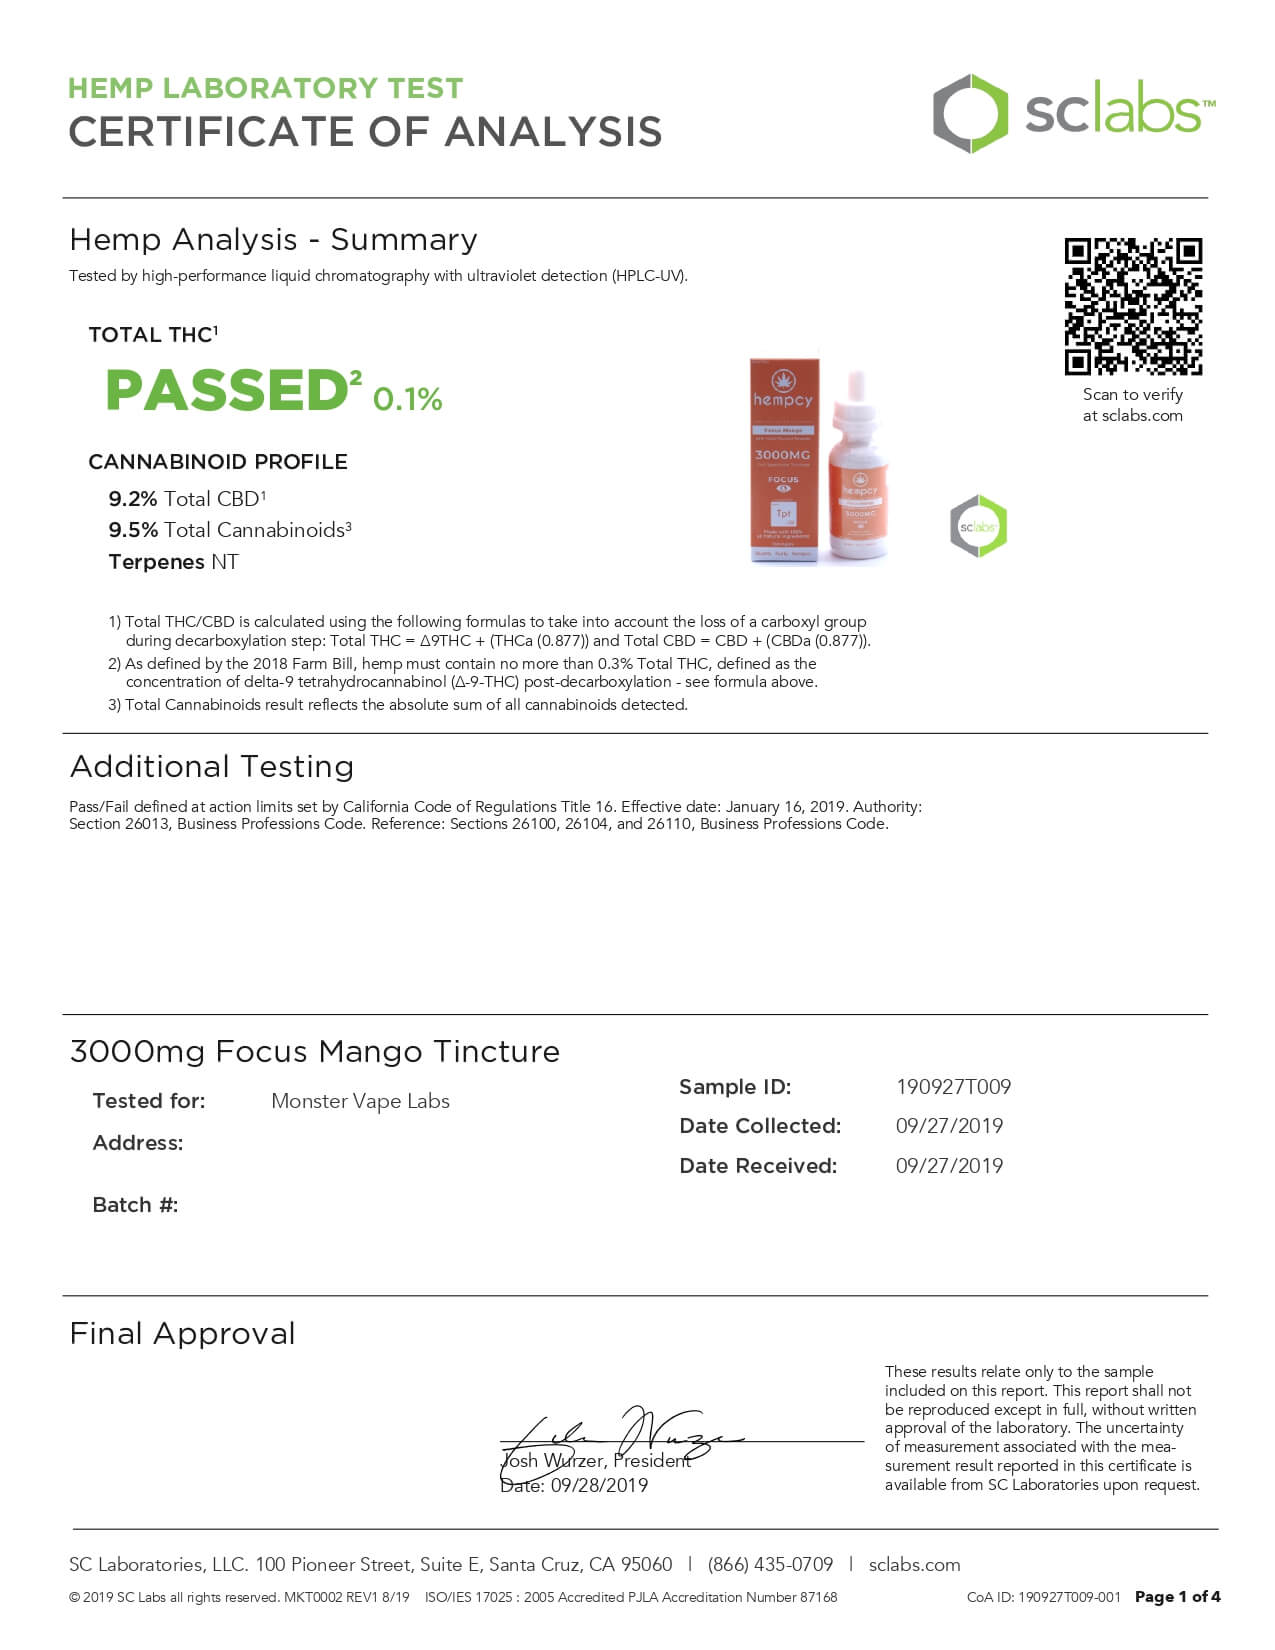 Hempcy CBD Edible Focus Mango 3000mg Lab Report